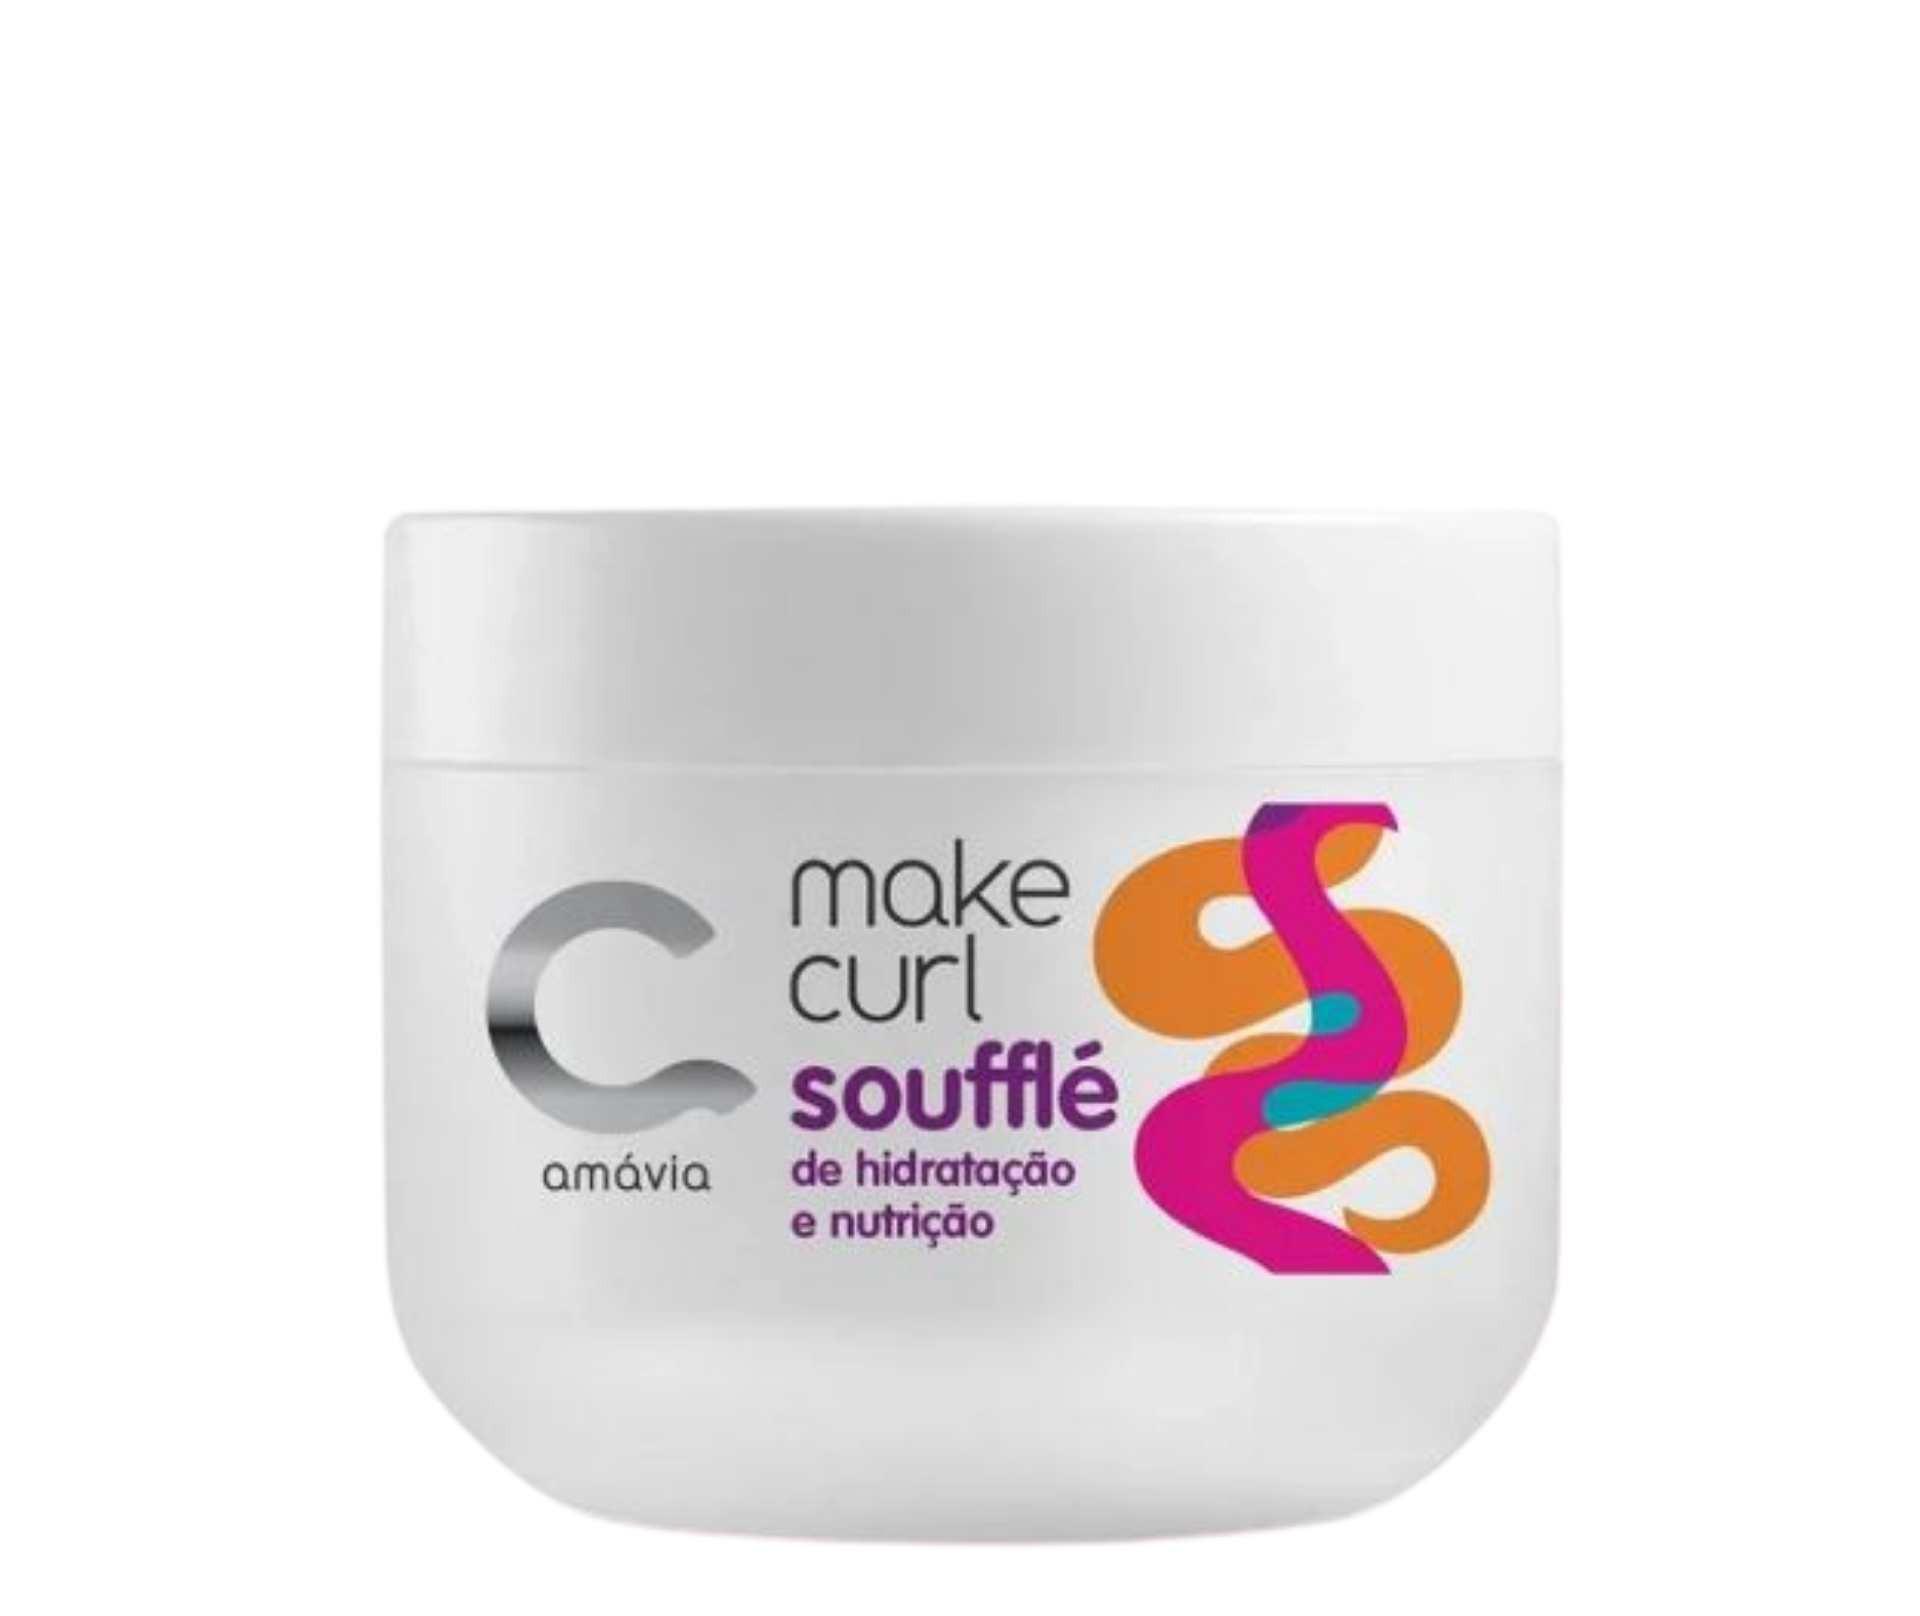 Amávia - Make Curl Souffle 300g